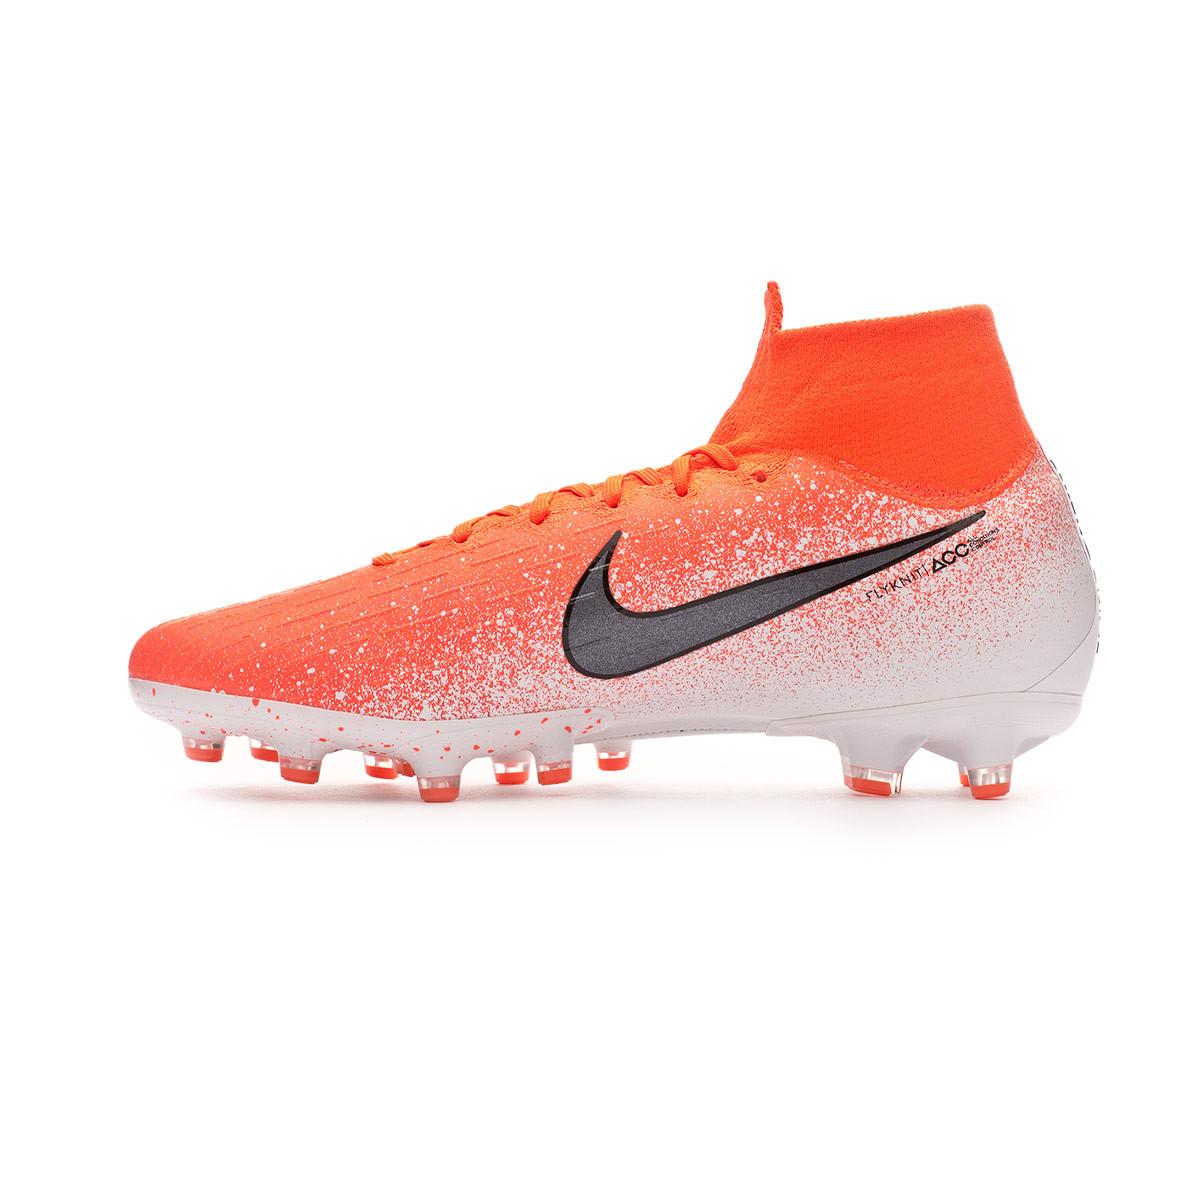 paquete Kakadu Cósmico  Football Boots Nike Mercurial Superfly VI Elite AG-Pro Hyper  crimson-Black-White - Football store Fútbol Emotion